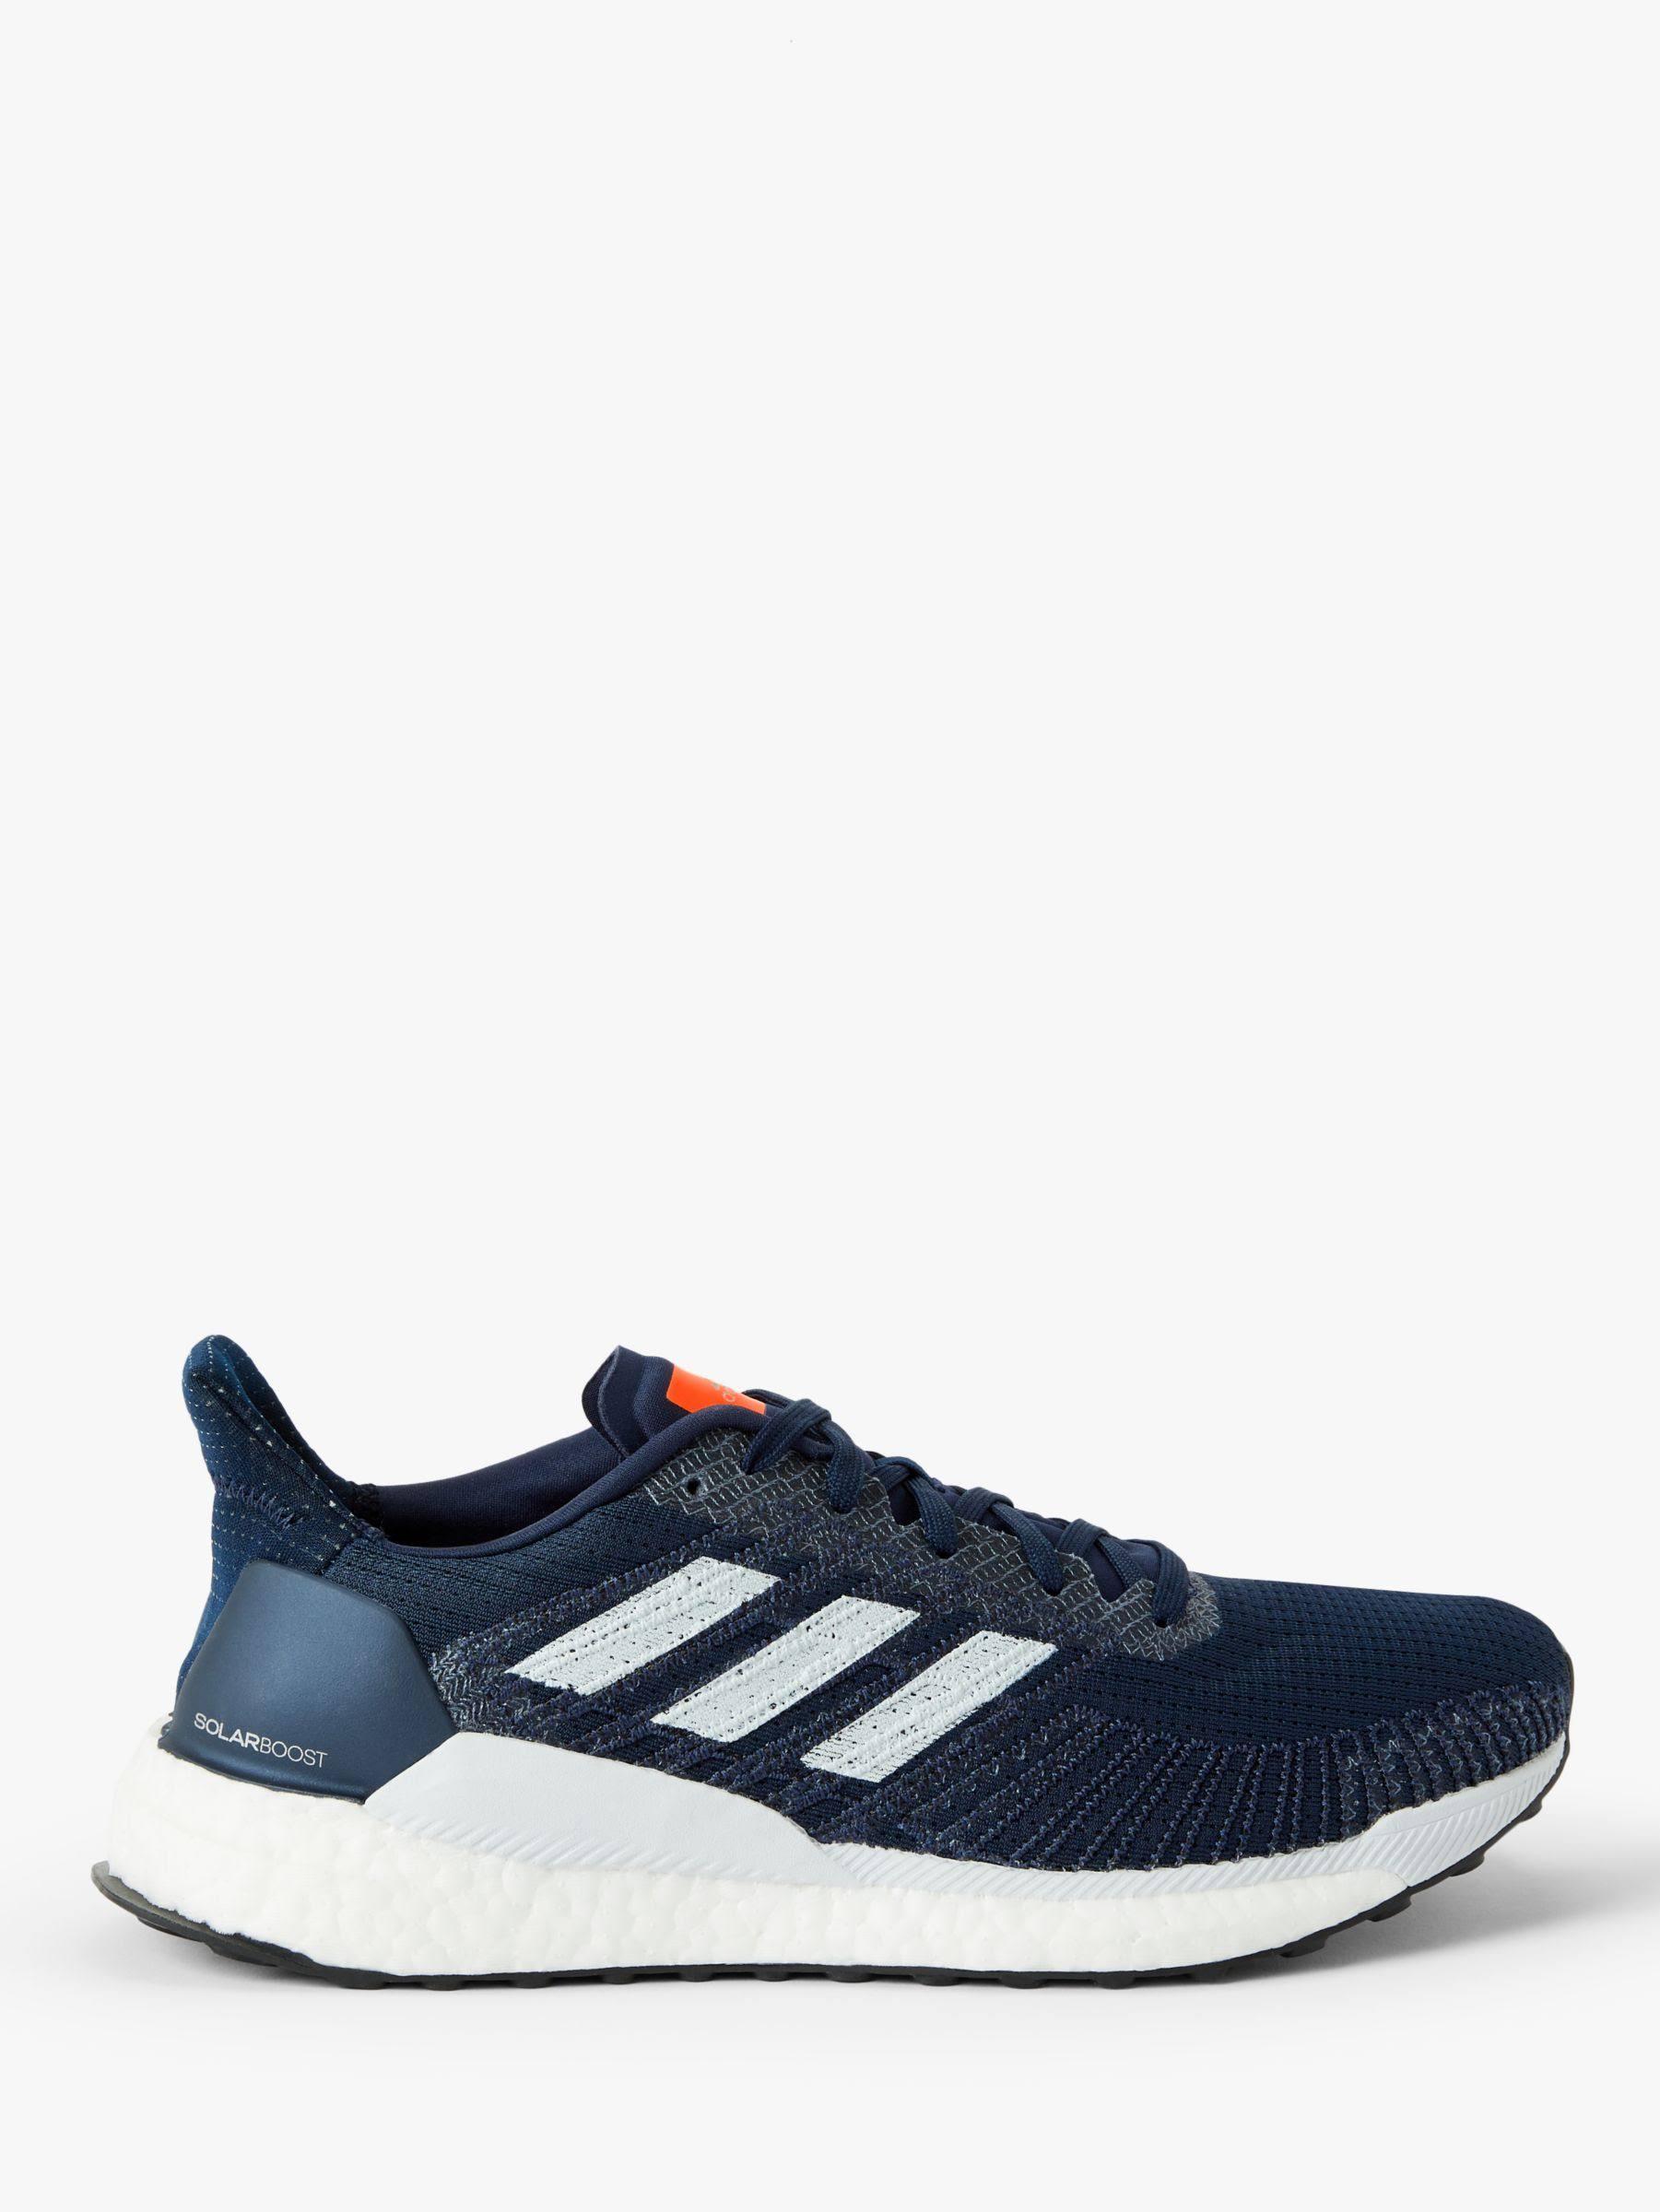 Adidas Solar Boost 19 Running Shoes - Navy Blue - 11